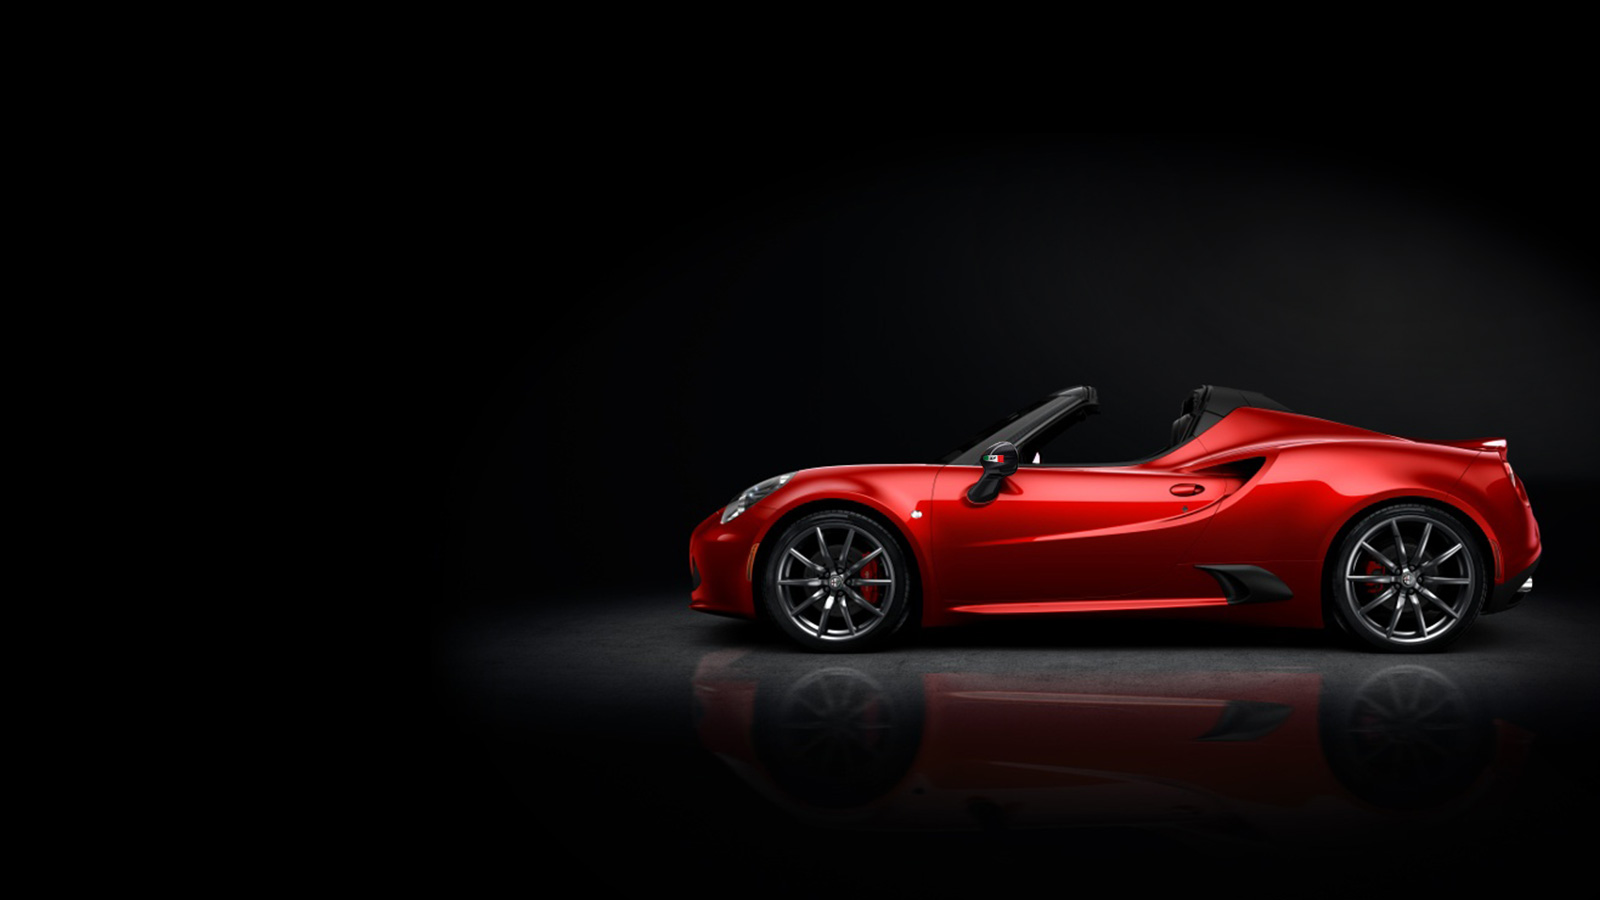 Watch additionally 5932 moreover Alfa Romeo 4c Spider Spy Pictures further Default in addition Les Plus Belles Voitures Du Salon De Lauto De Detroit 2016. on alfa romeo 4c spider